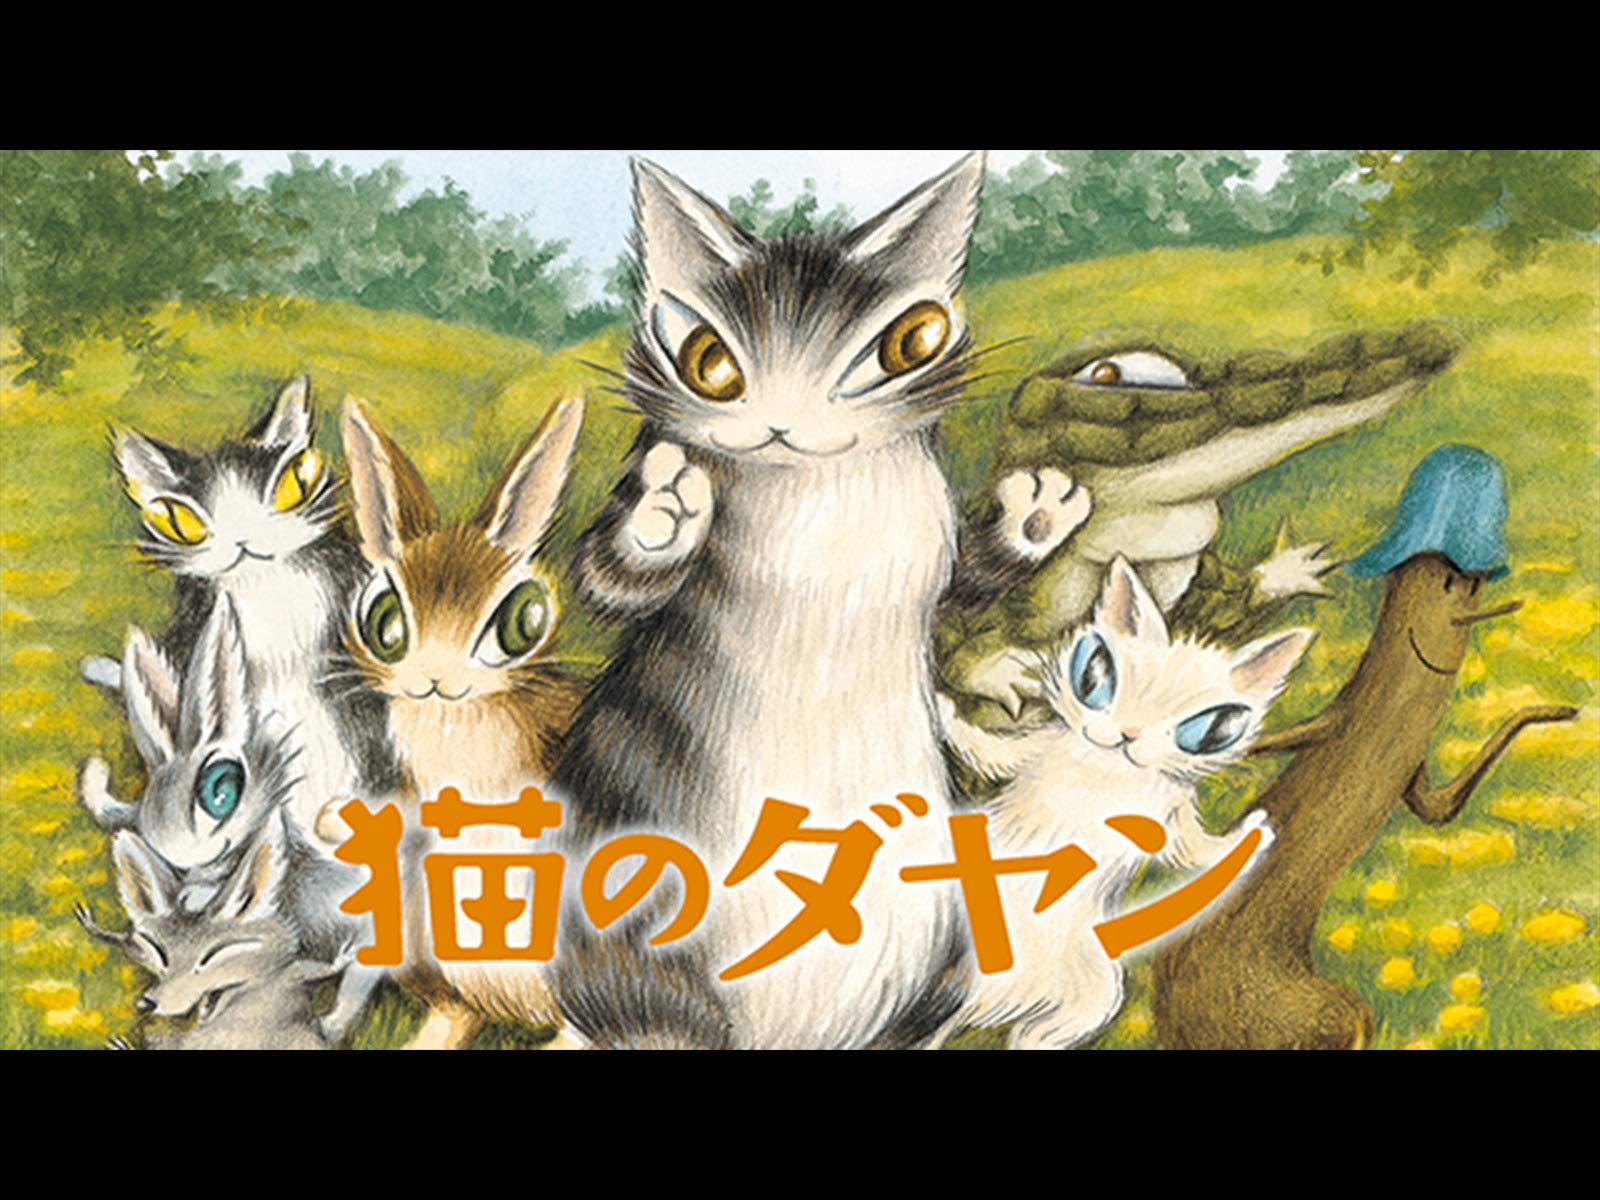 Amazon Co Jp 猫のダヤン Dアニメストア を観る Prime Video